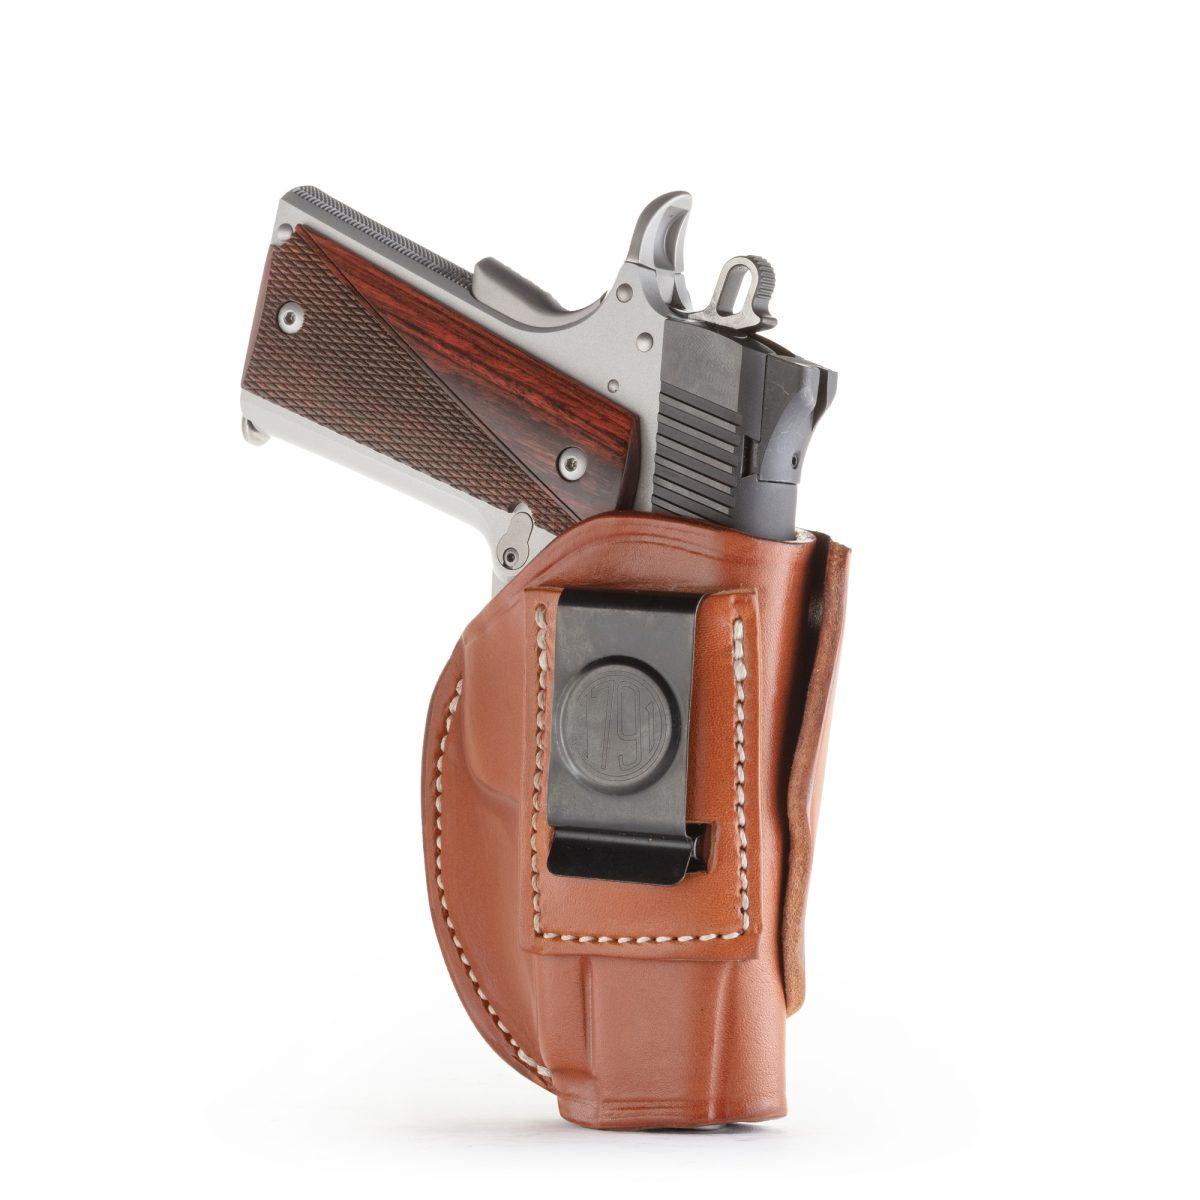 4 Way Concealment & Belt Leather Holster